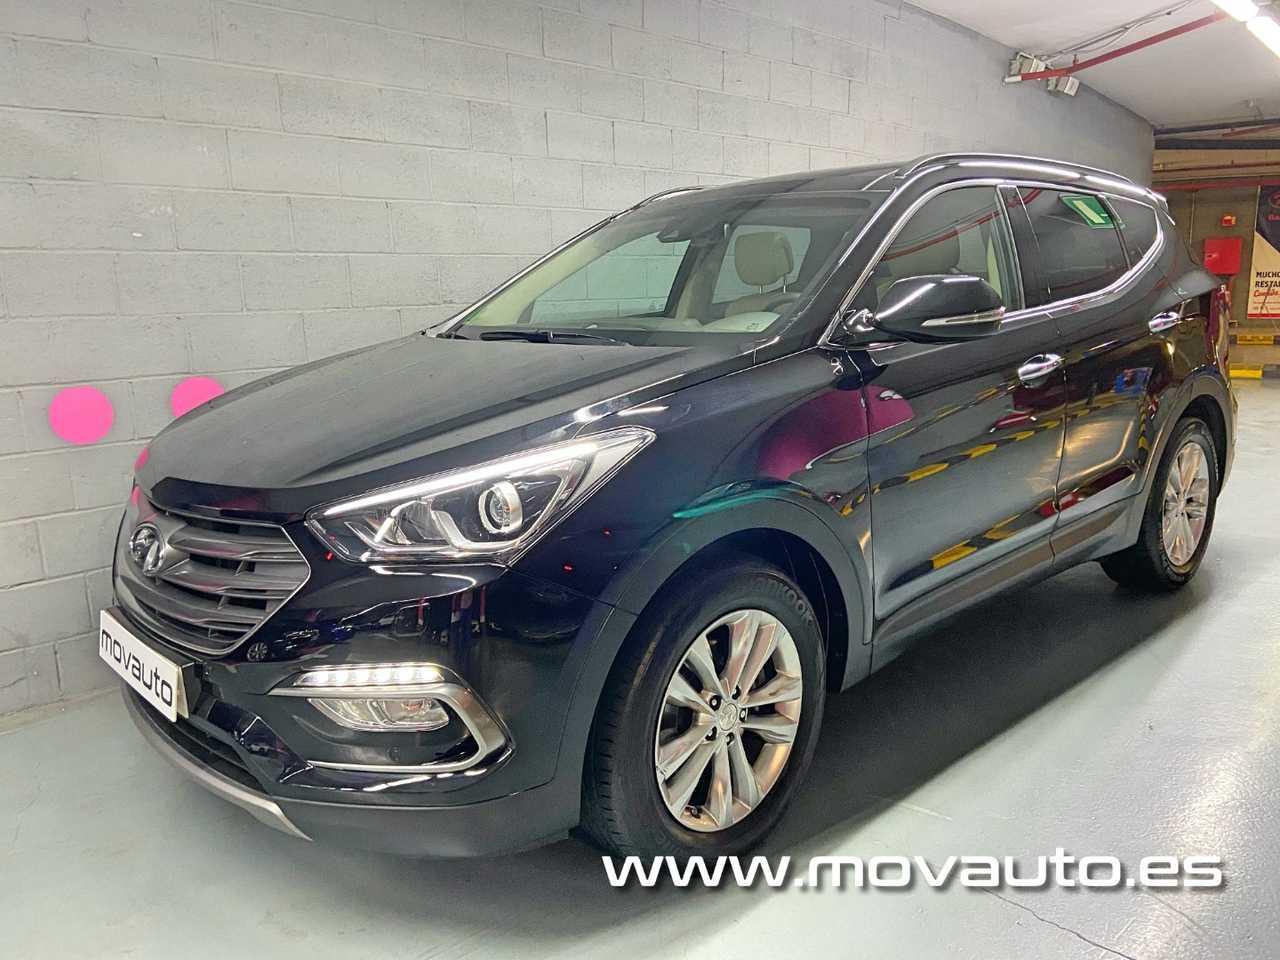 Hyundai Santa Fe 2.2 CRDi 200cv aut. Tecno   - Foto 1